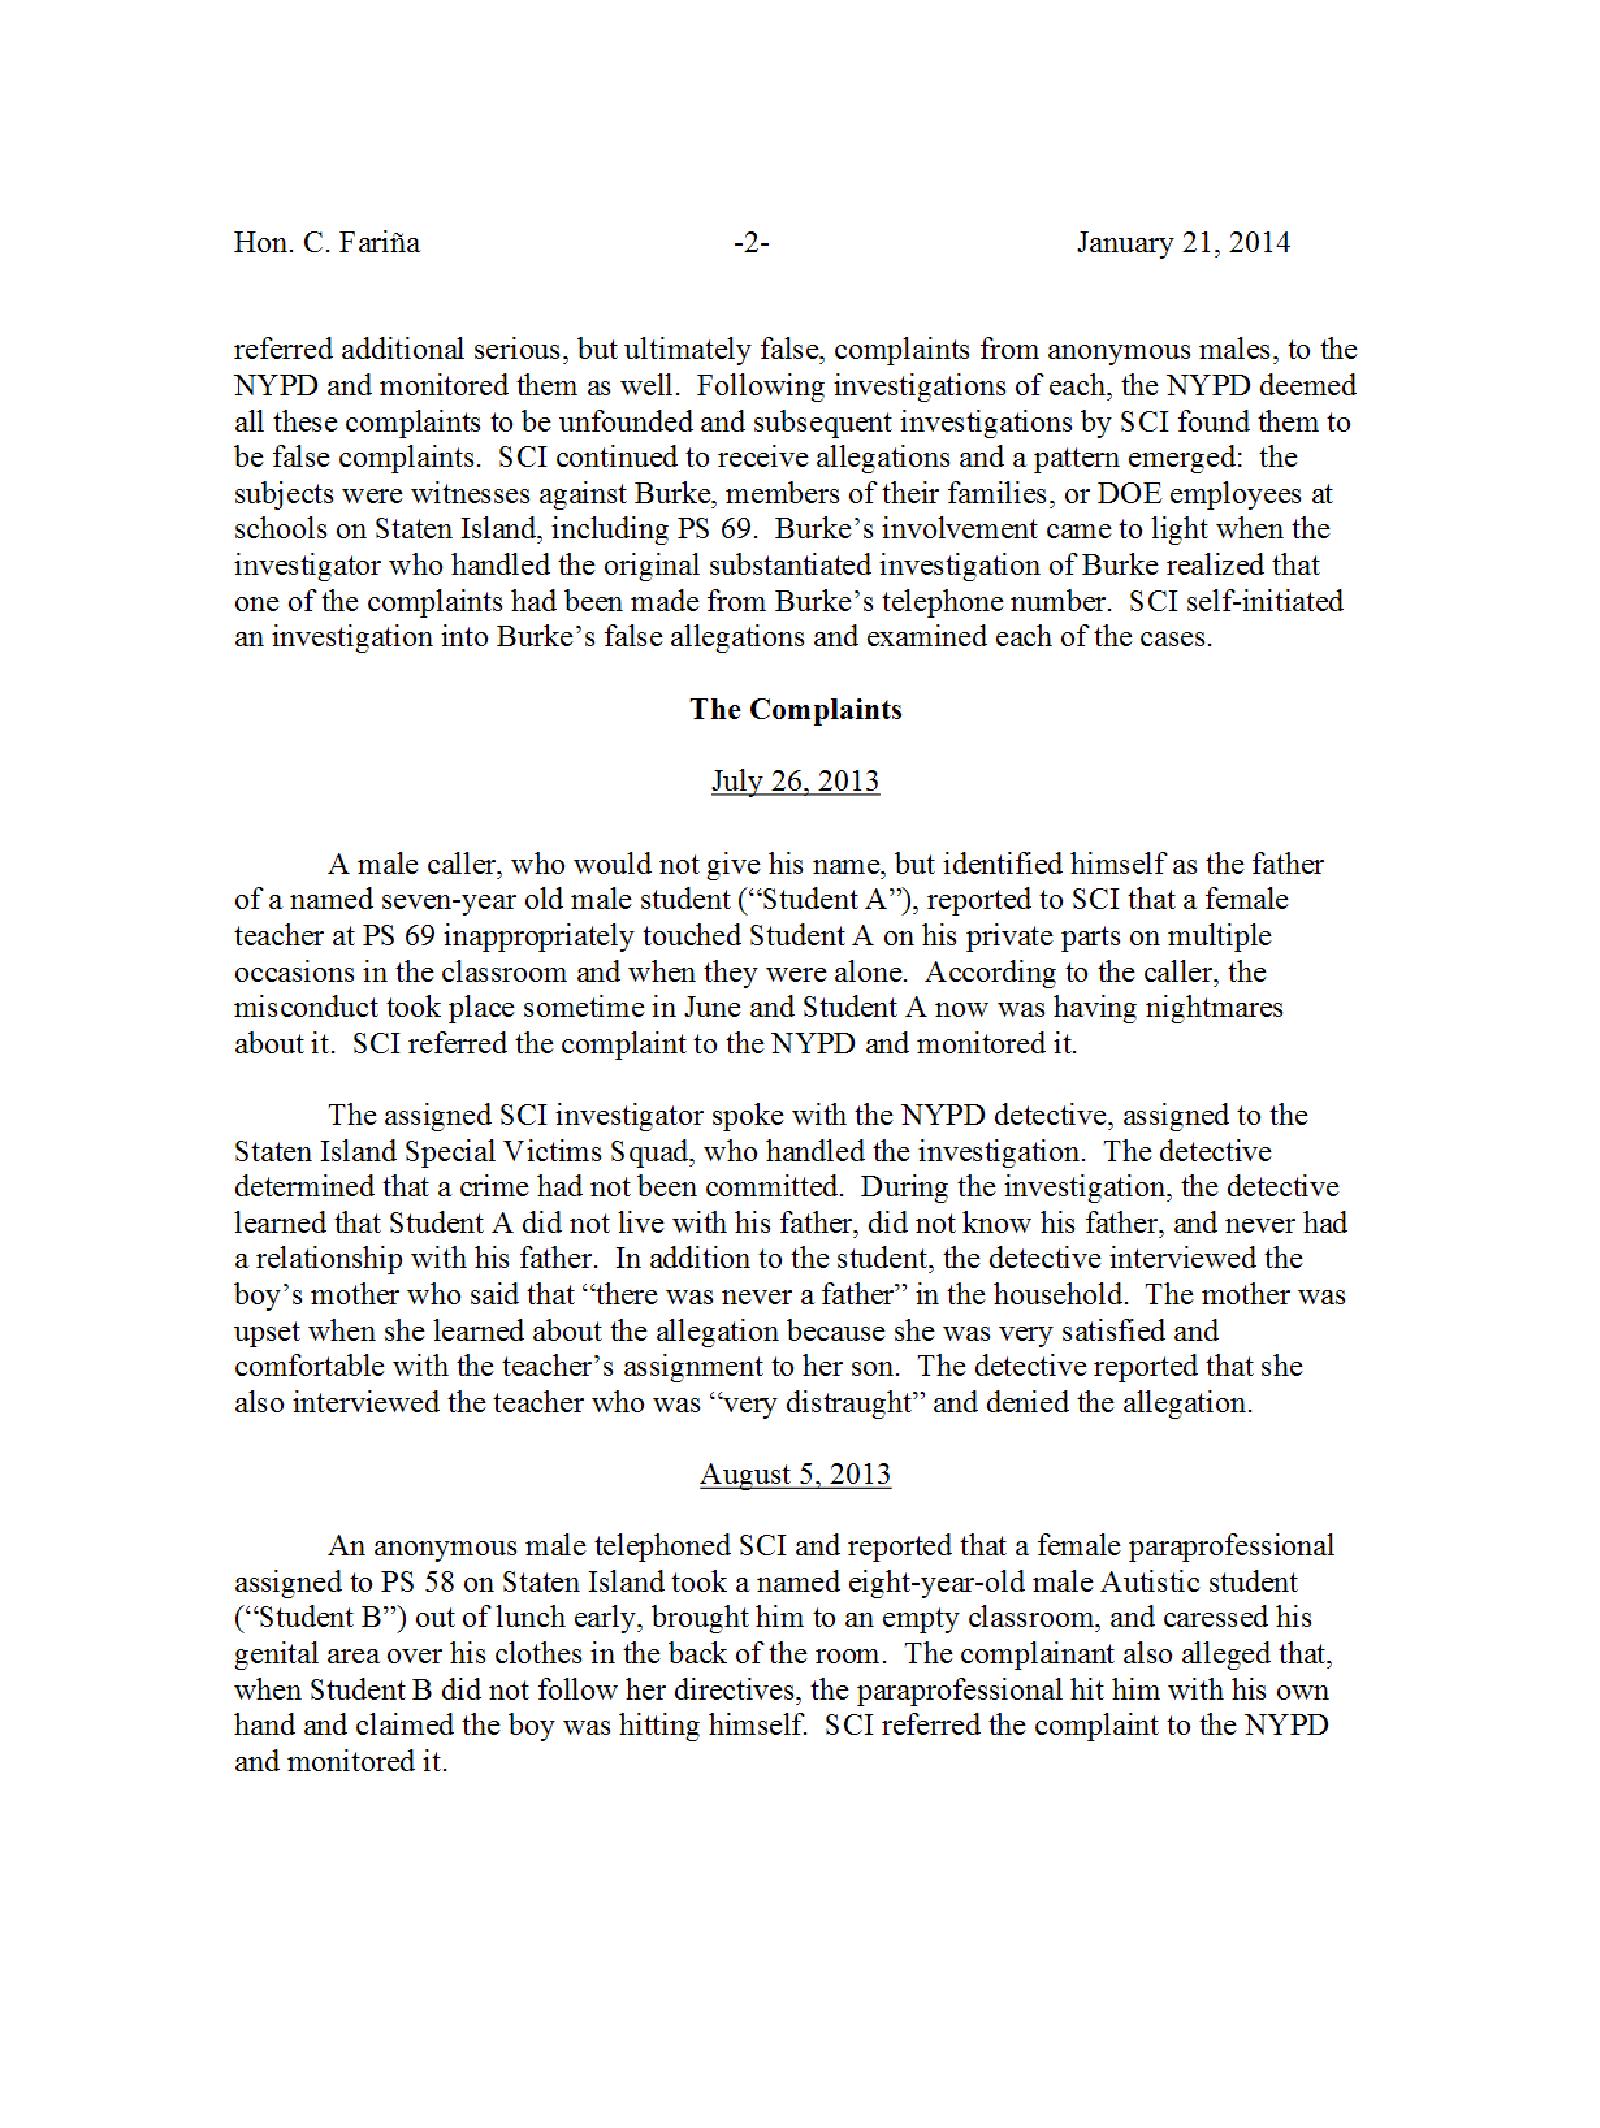 Copy of 1-22-2014 9-25-02 AM02.png